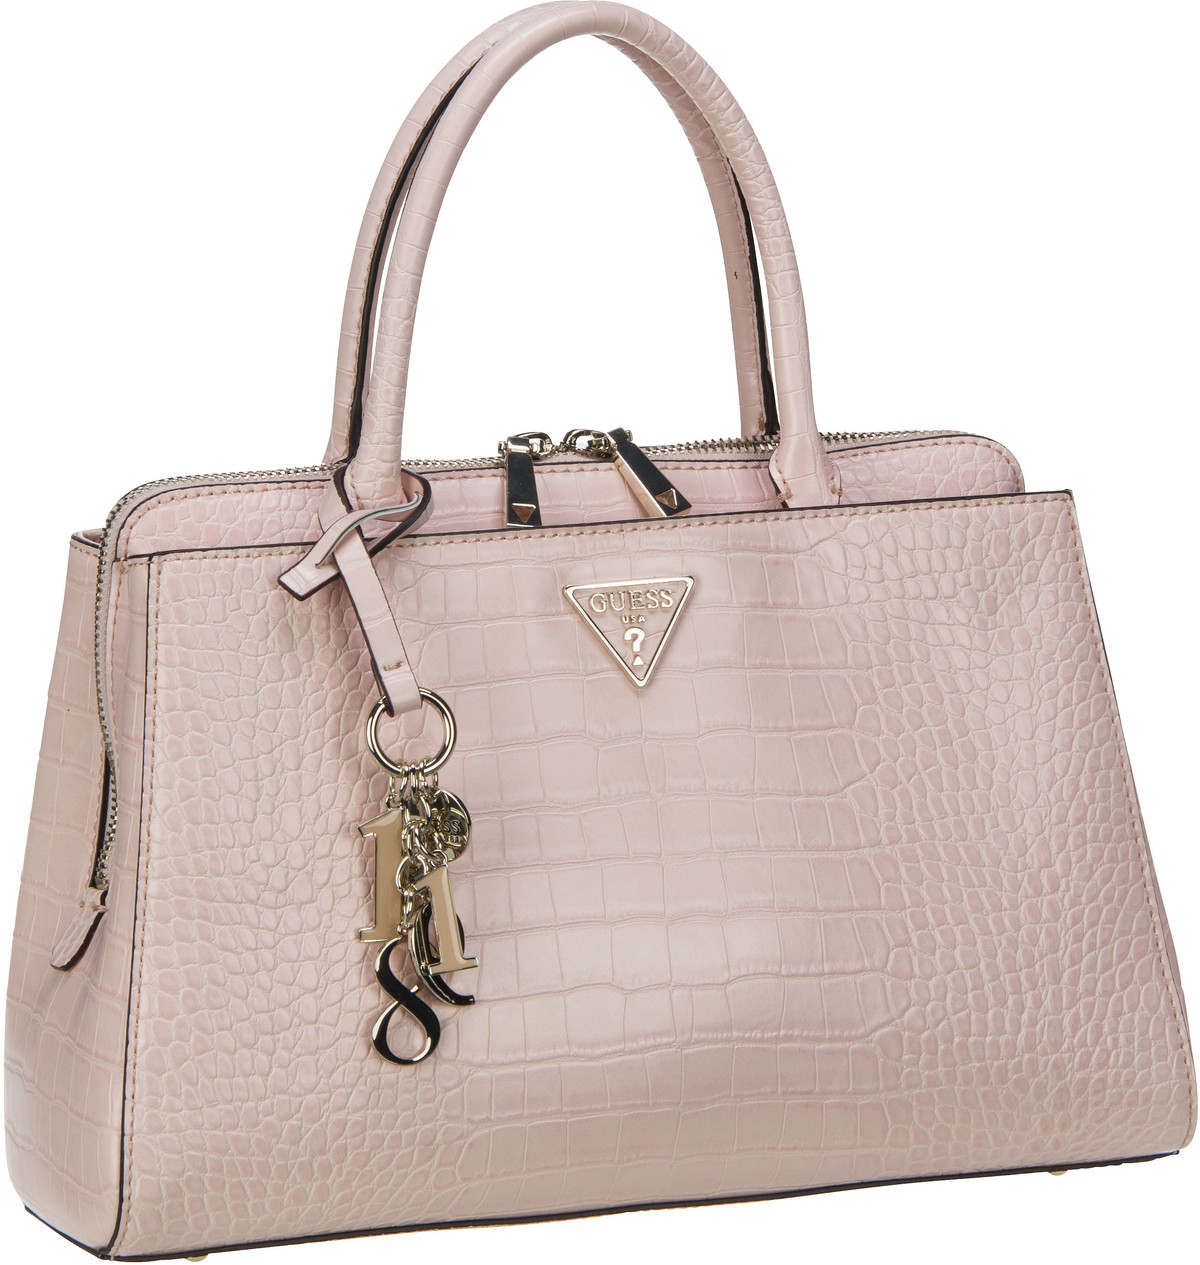 Handtasche Maddy Girlfriend Satchel Peony